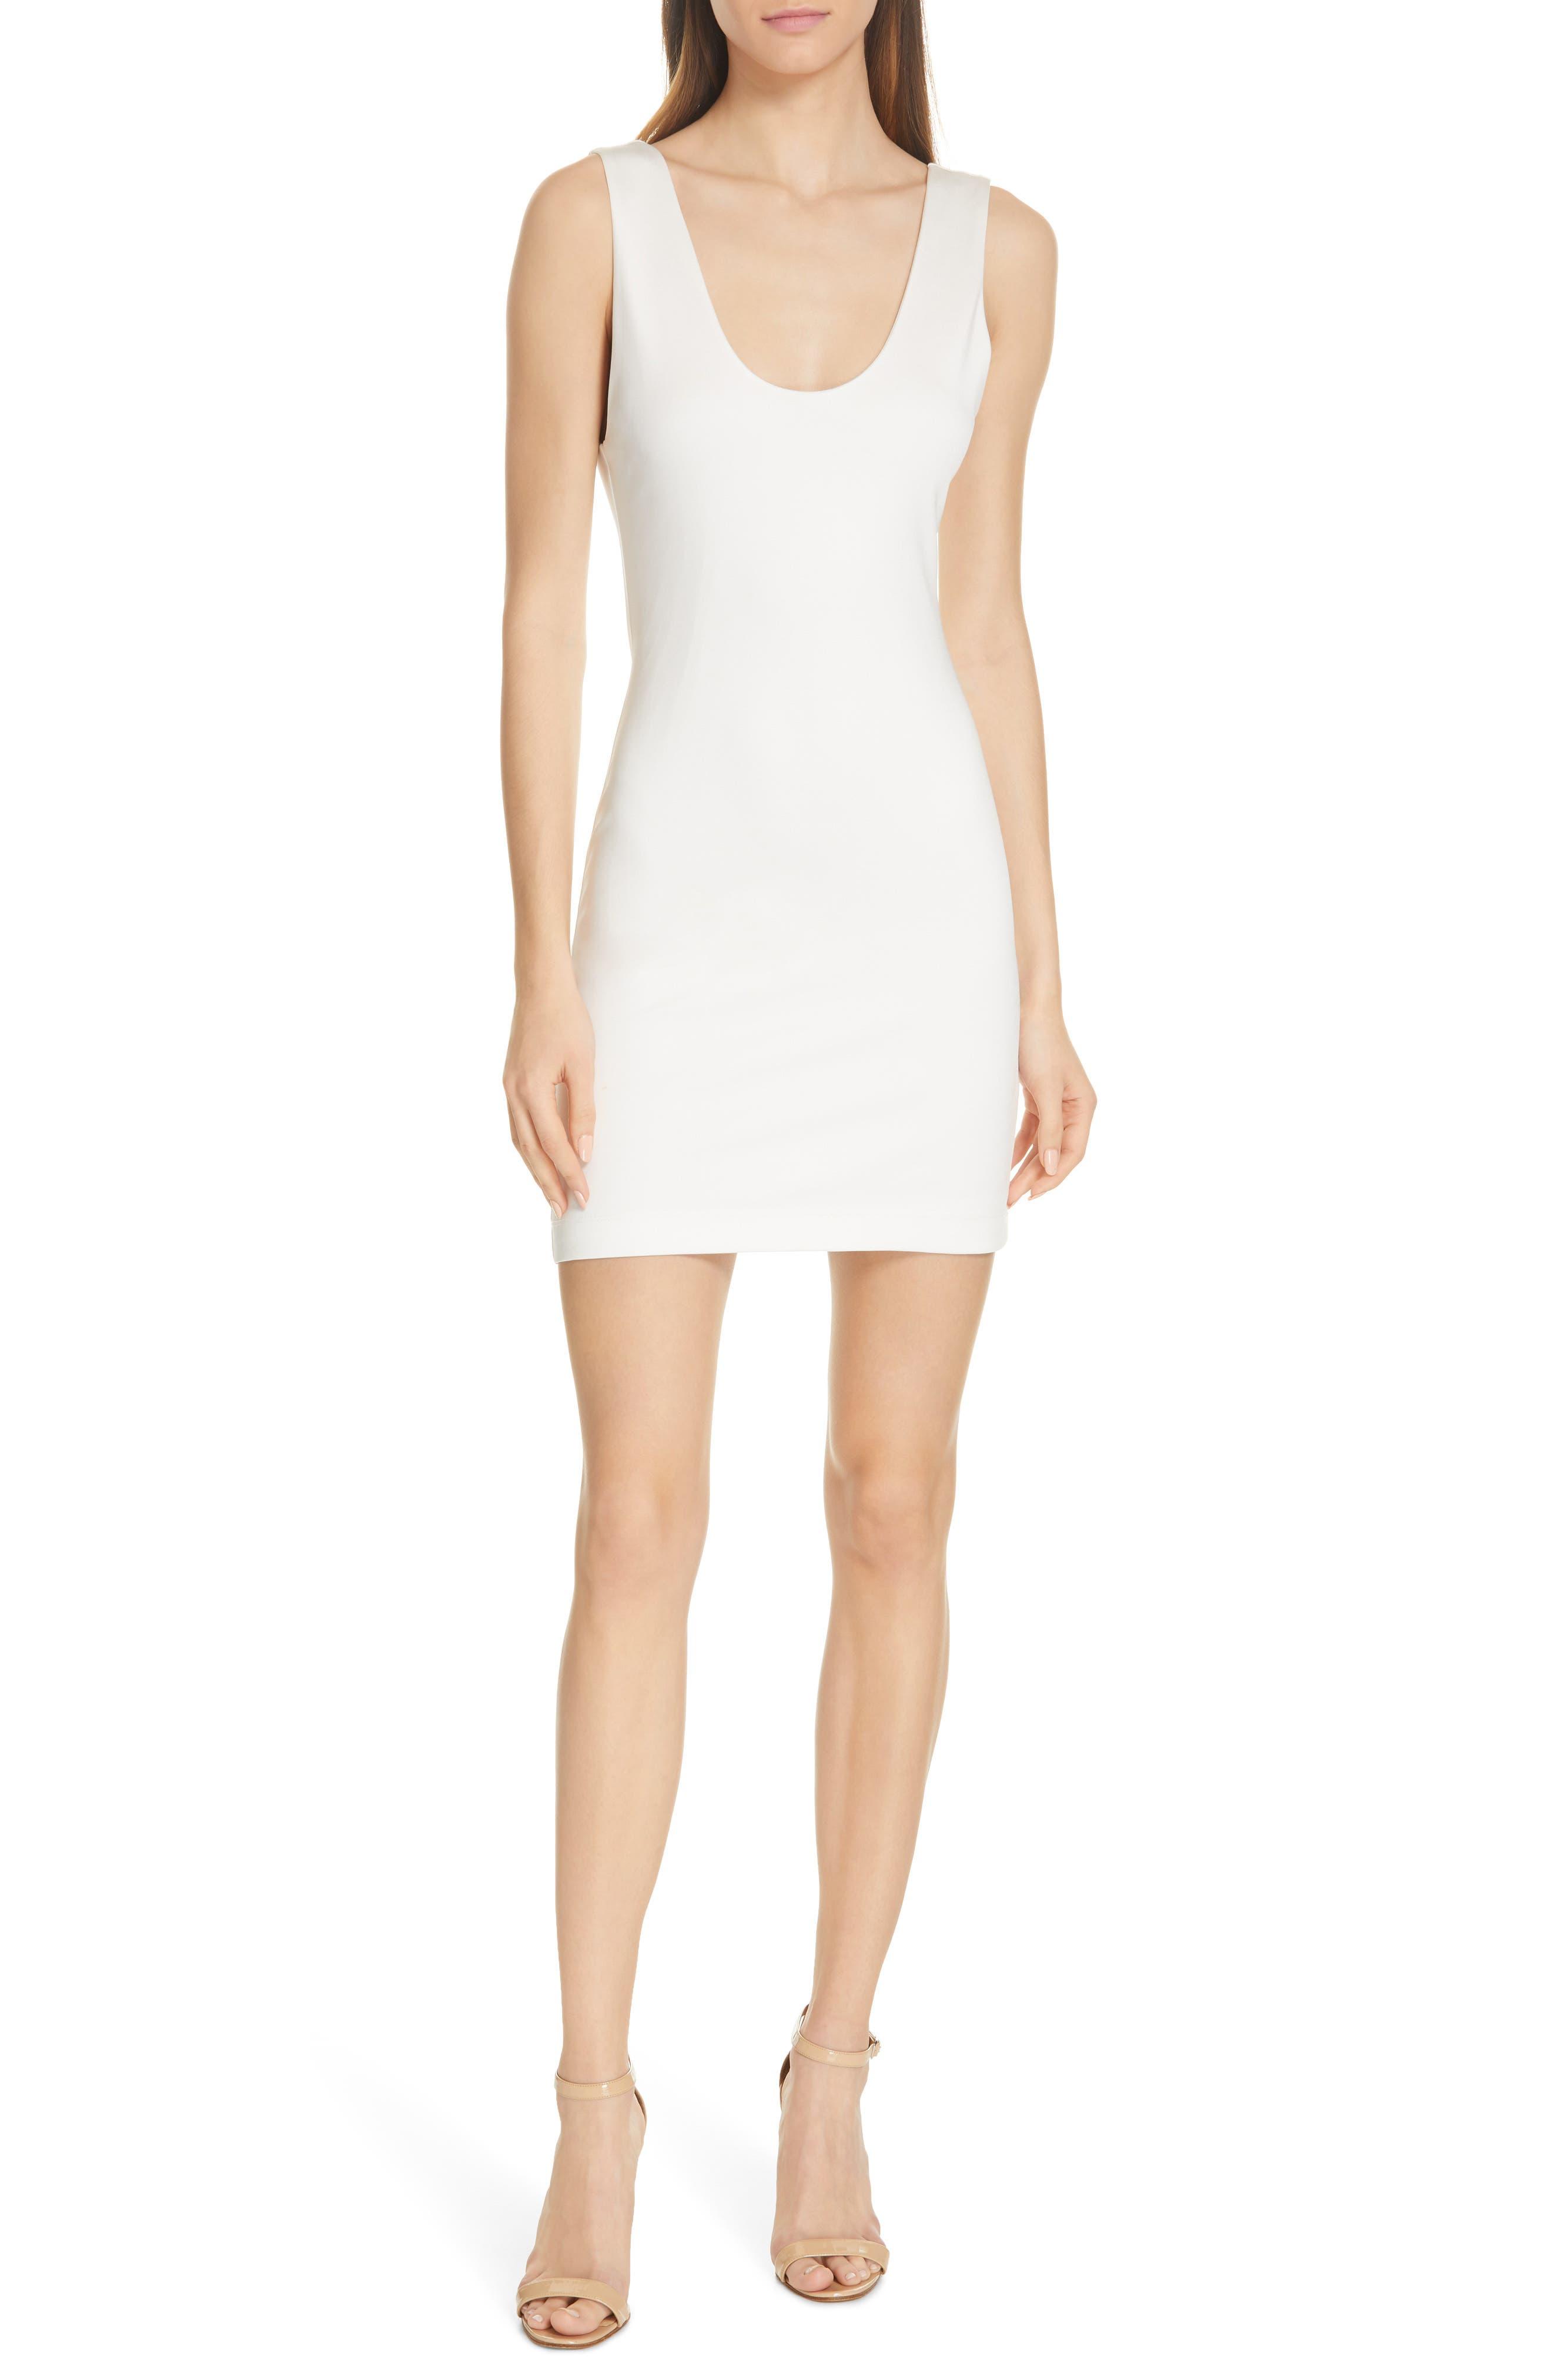 Alice + Olivia James Scoop Neck Body-Con Tank Dress, Ivory